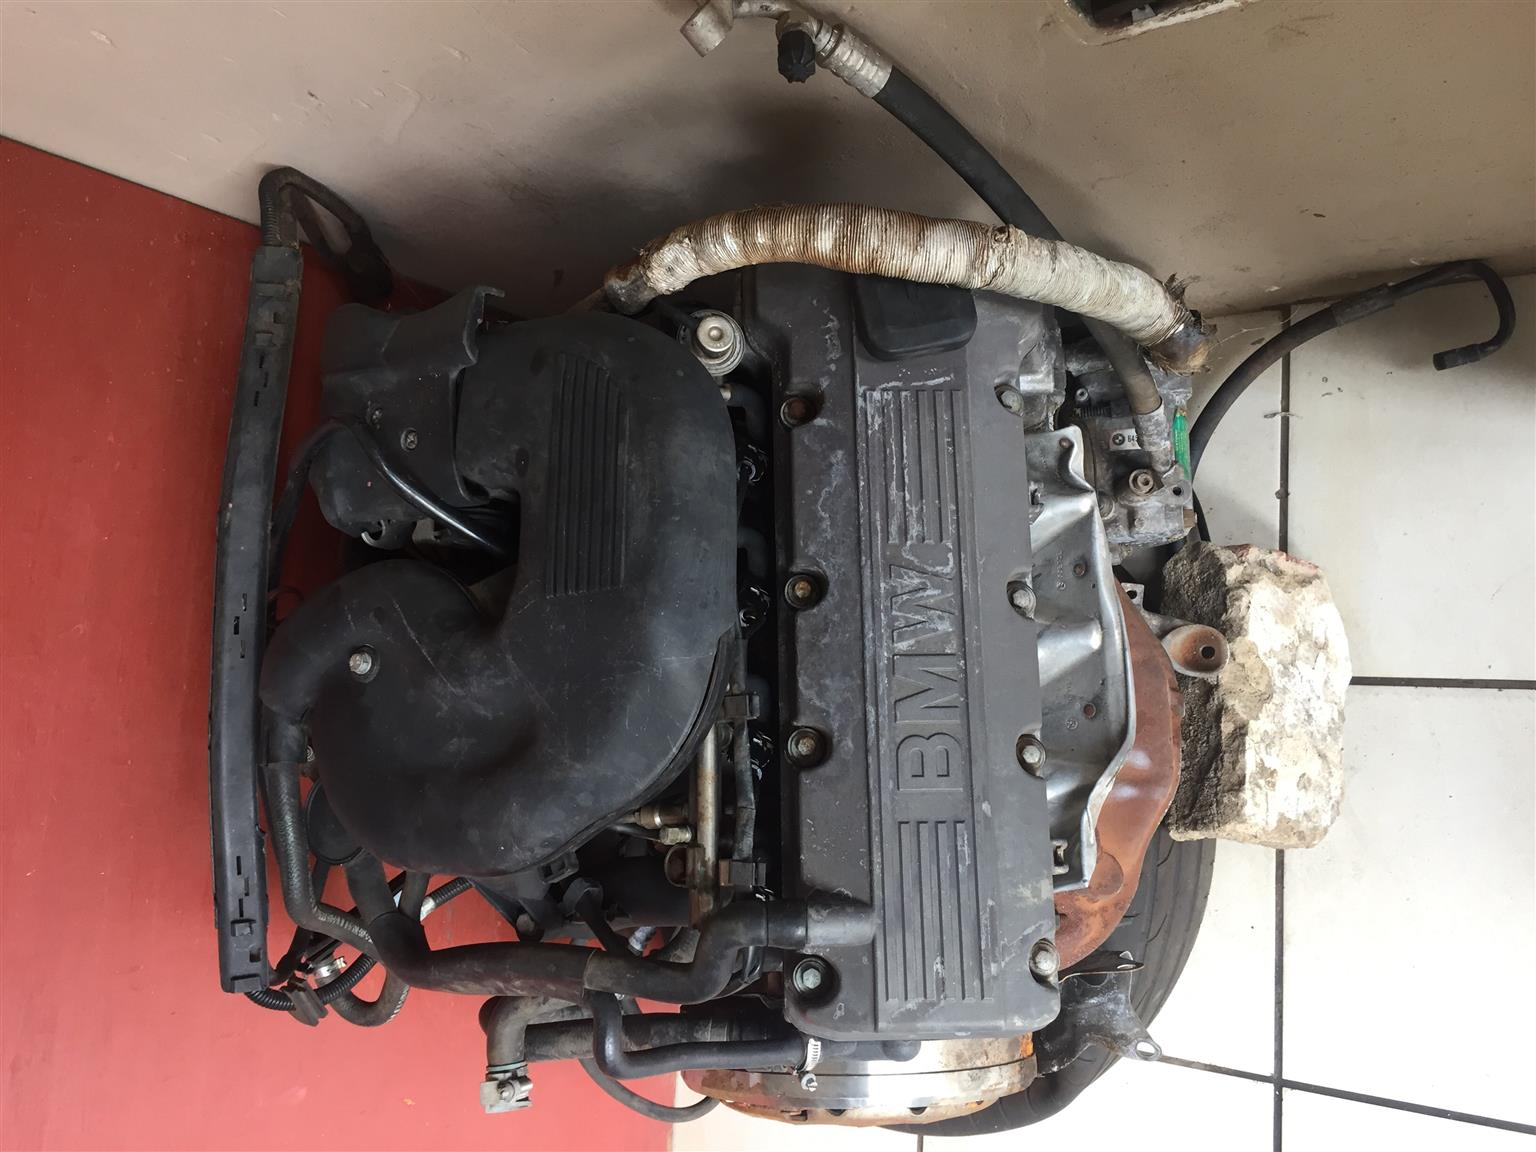 BMW 318 engine for sale